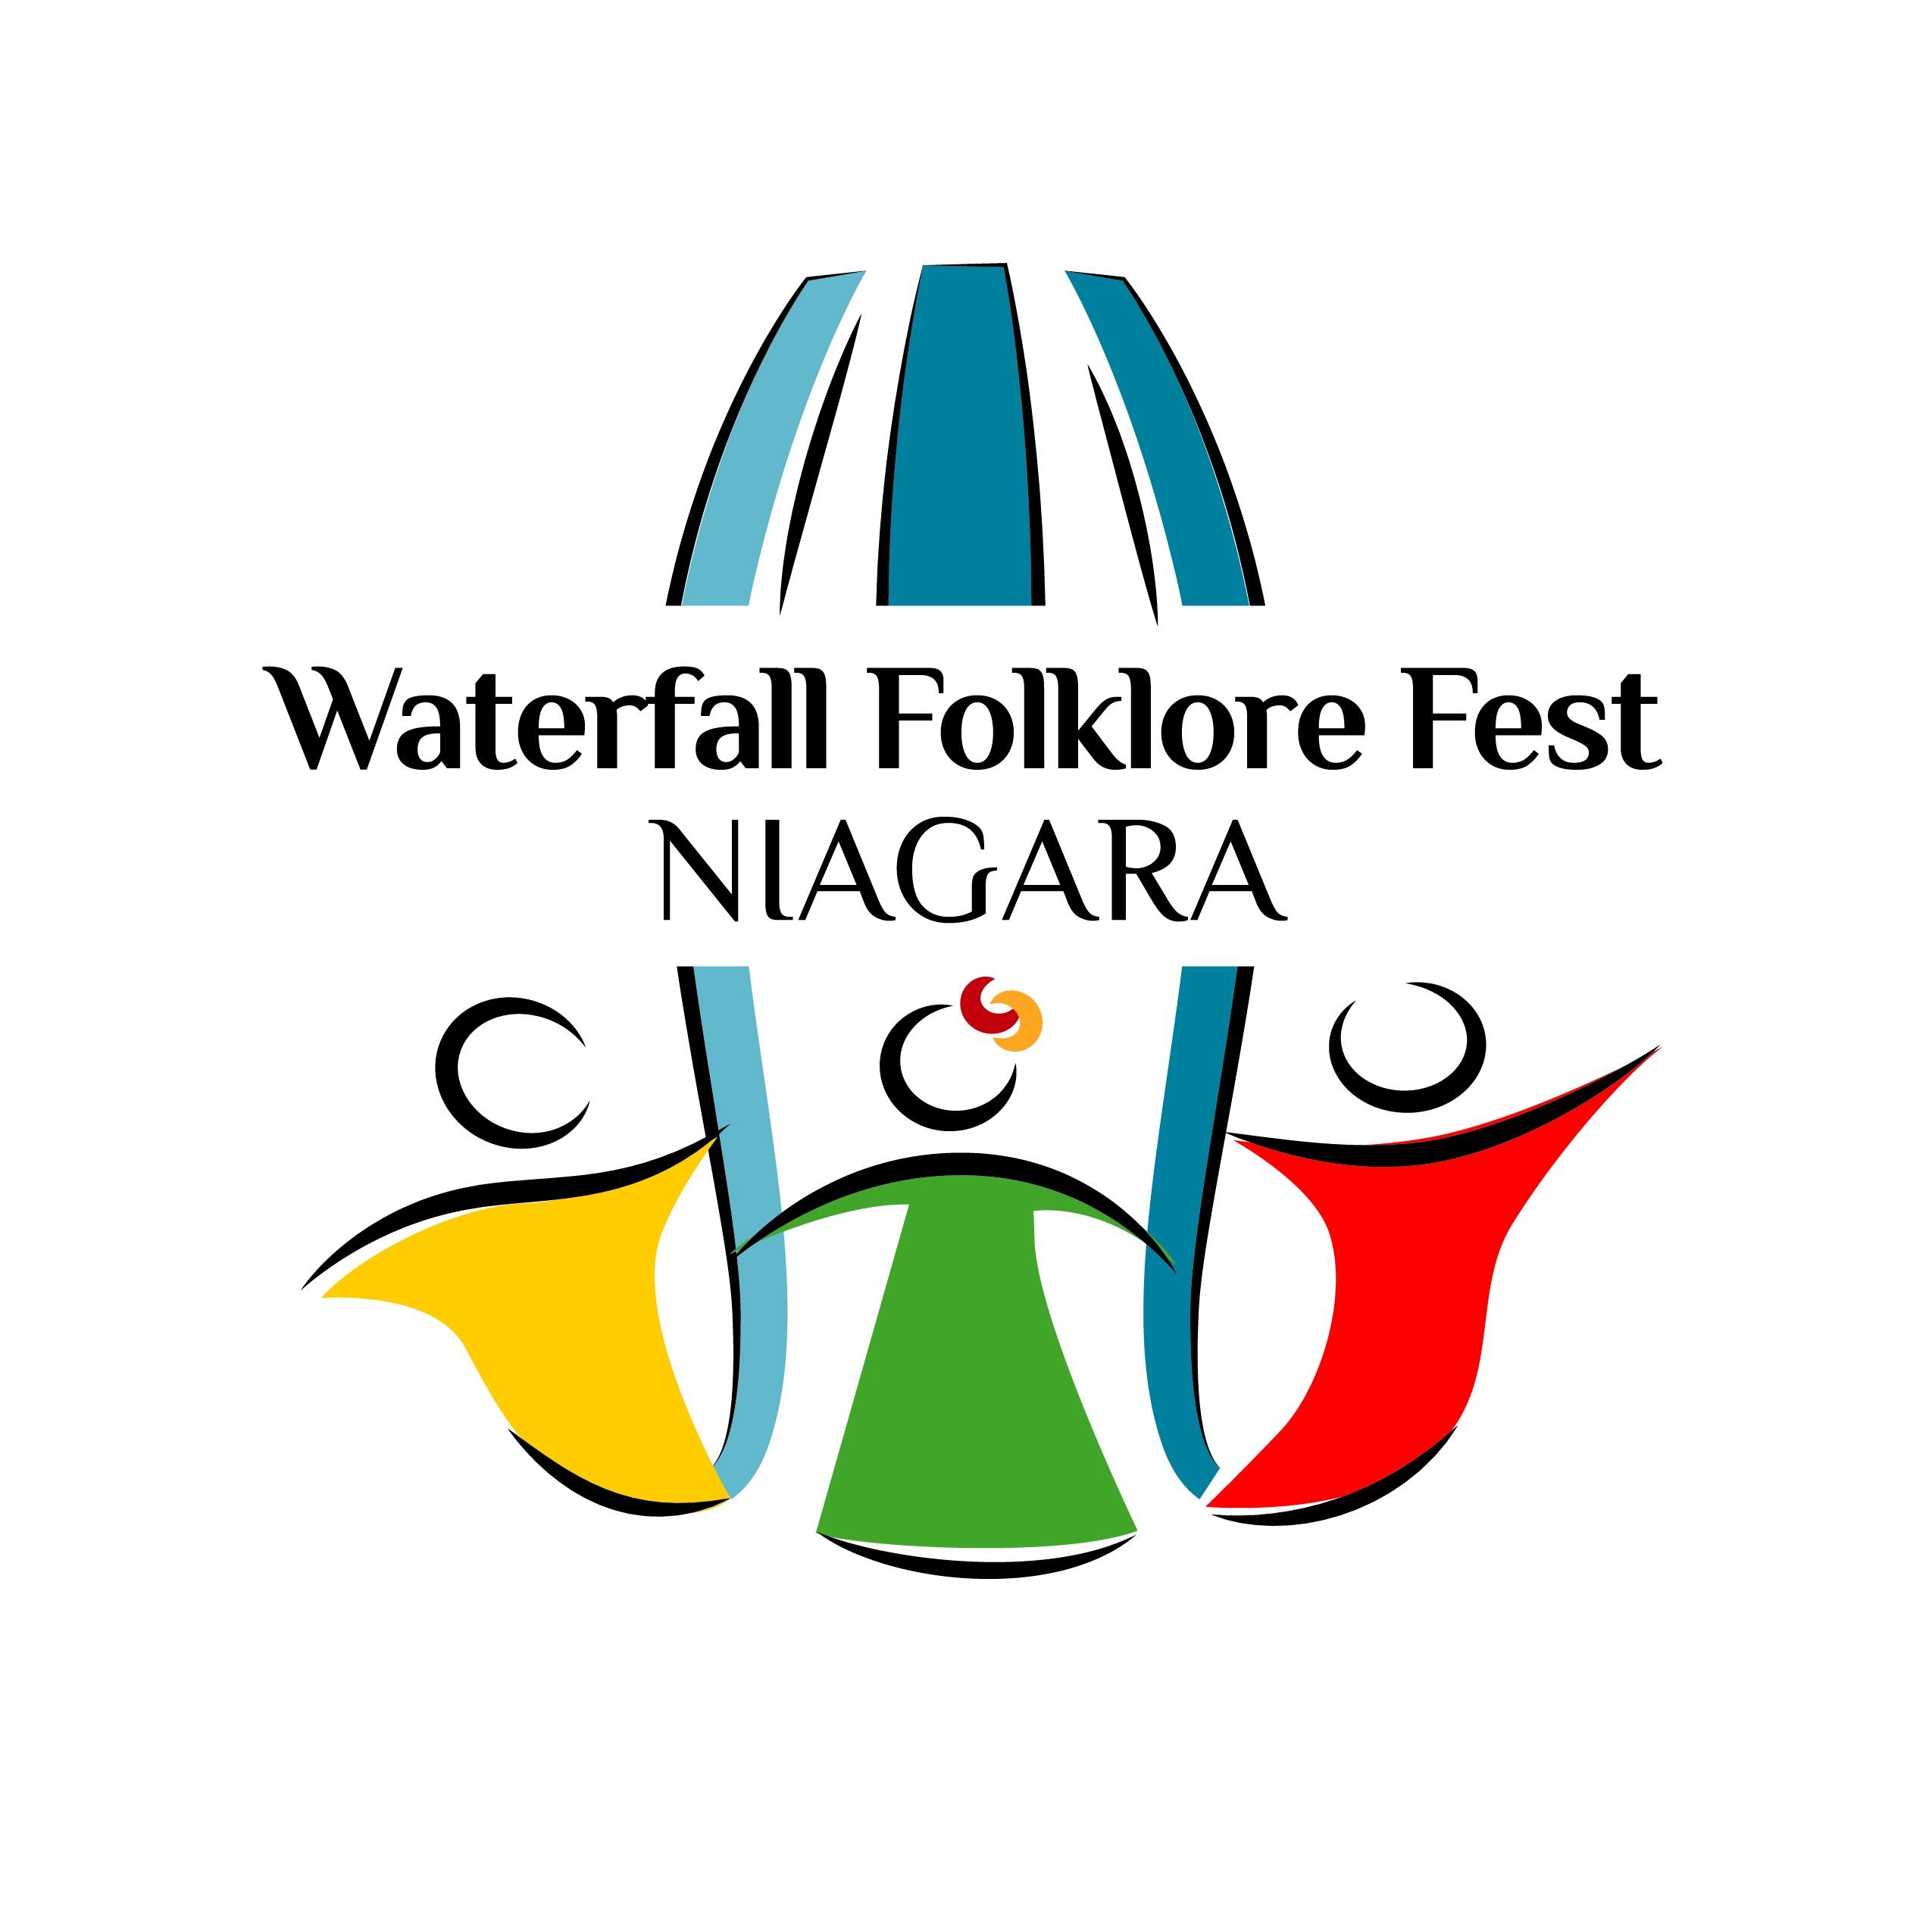 WATERFALL FOLKLORE FEST NIAGARA | A gathering of folklore